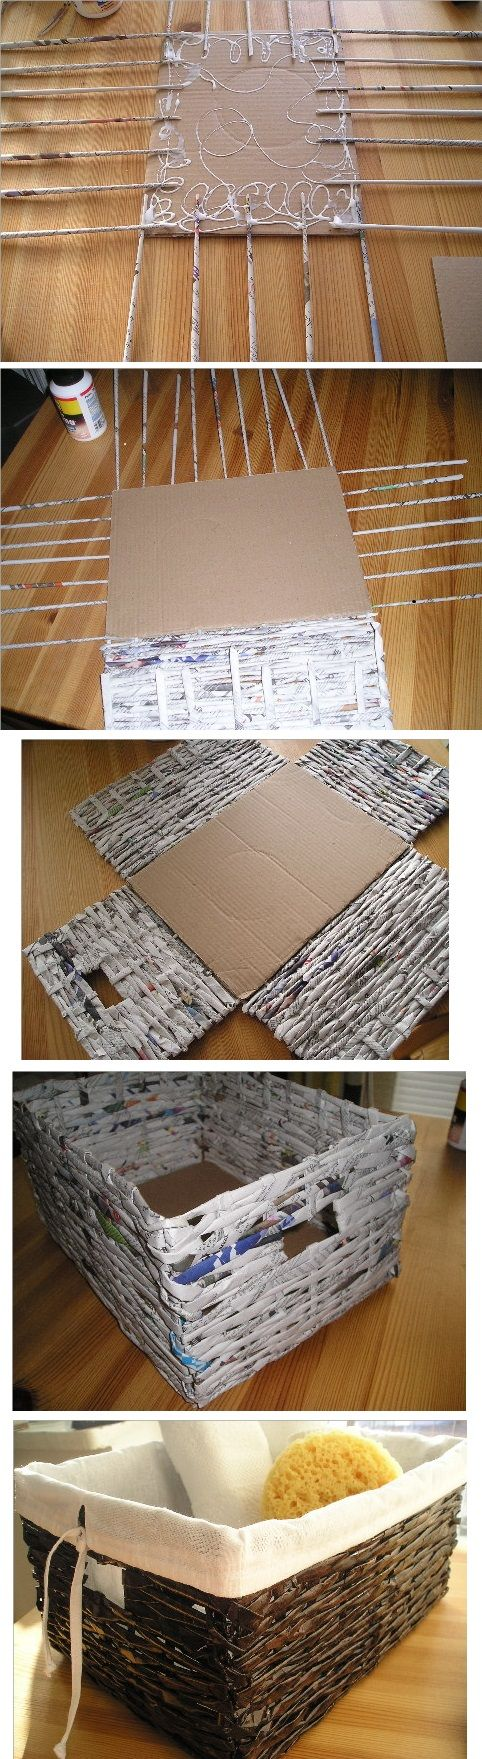 Cesto di carta